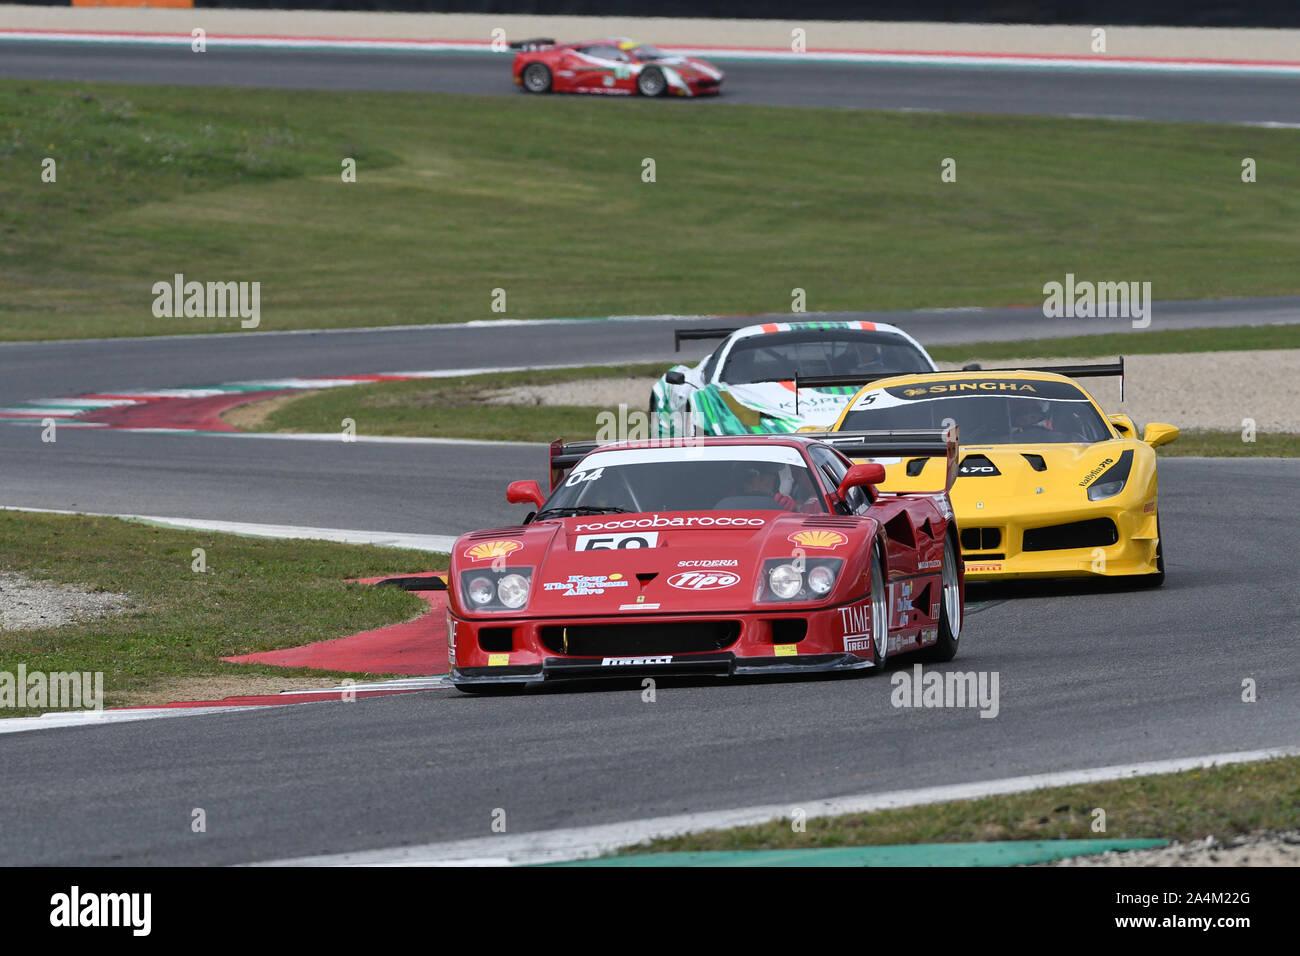 MUGELLO, IT, October, 2017: Vintage Ferrari F40 GT in action at the Mugello Circuit during Finali Mondiali Ferrari 2017. italy. Stock Photo